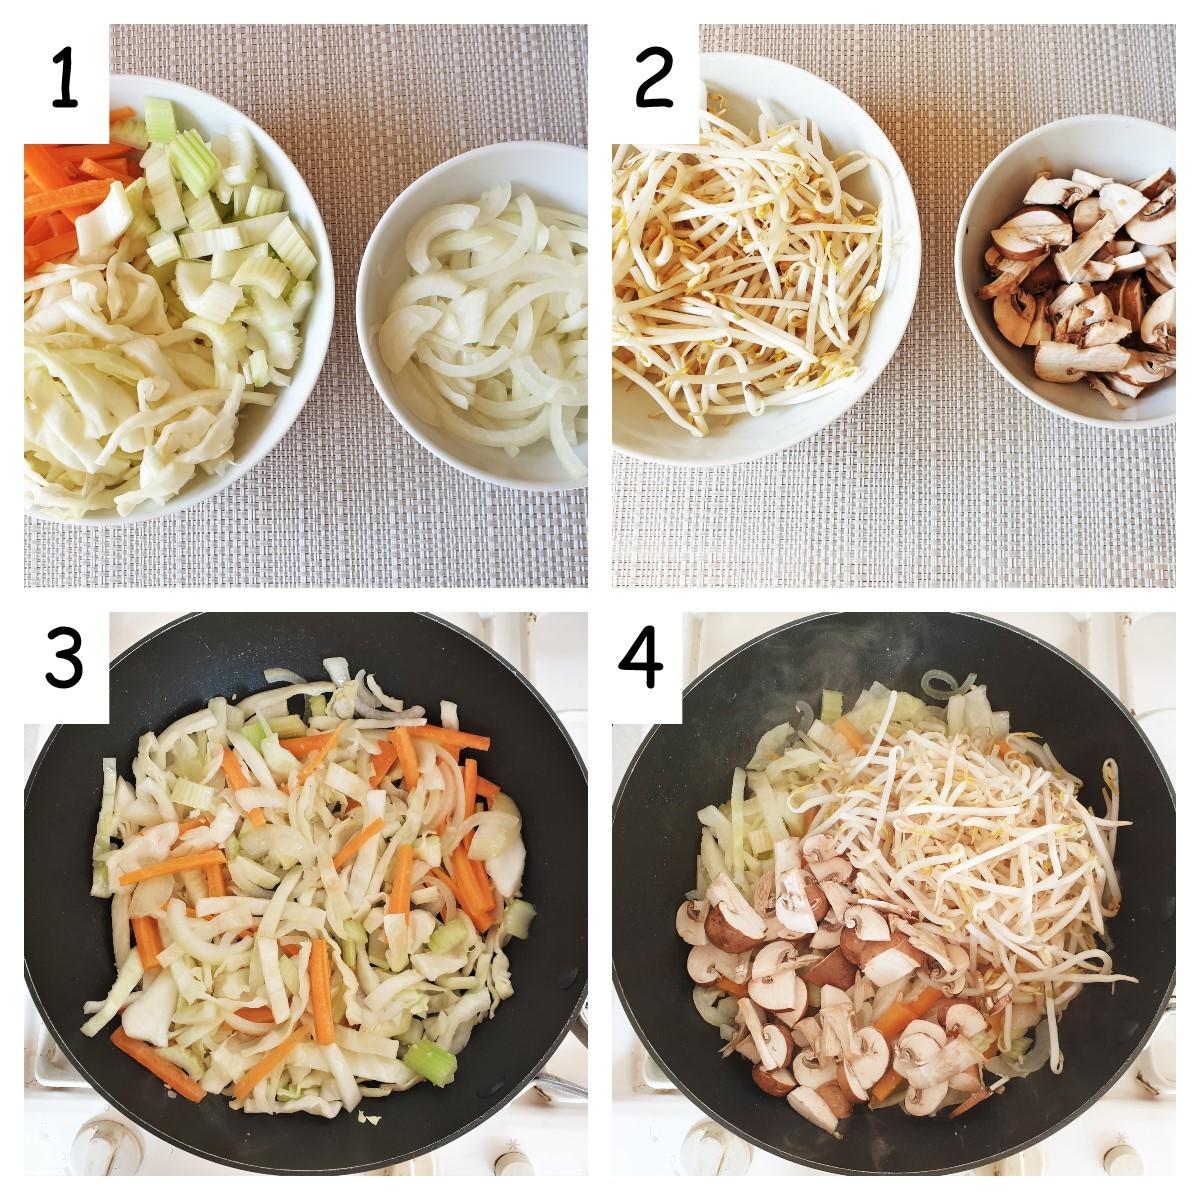 Steps for preparing the vegetables.